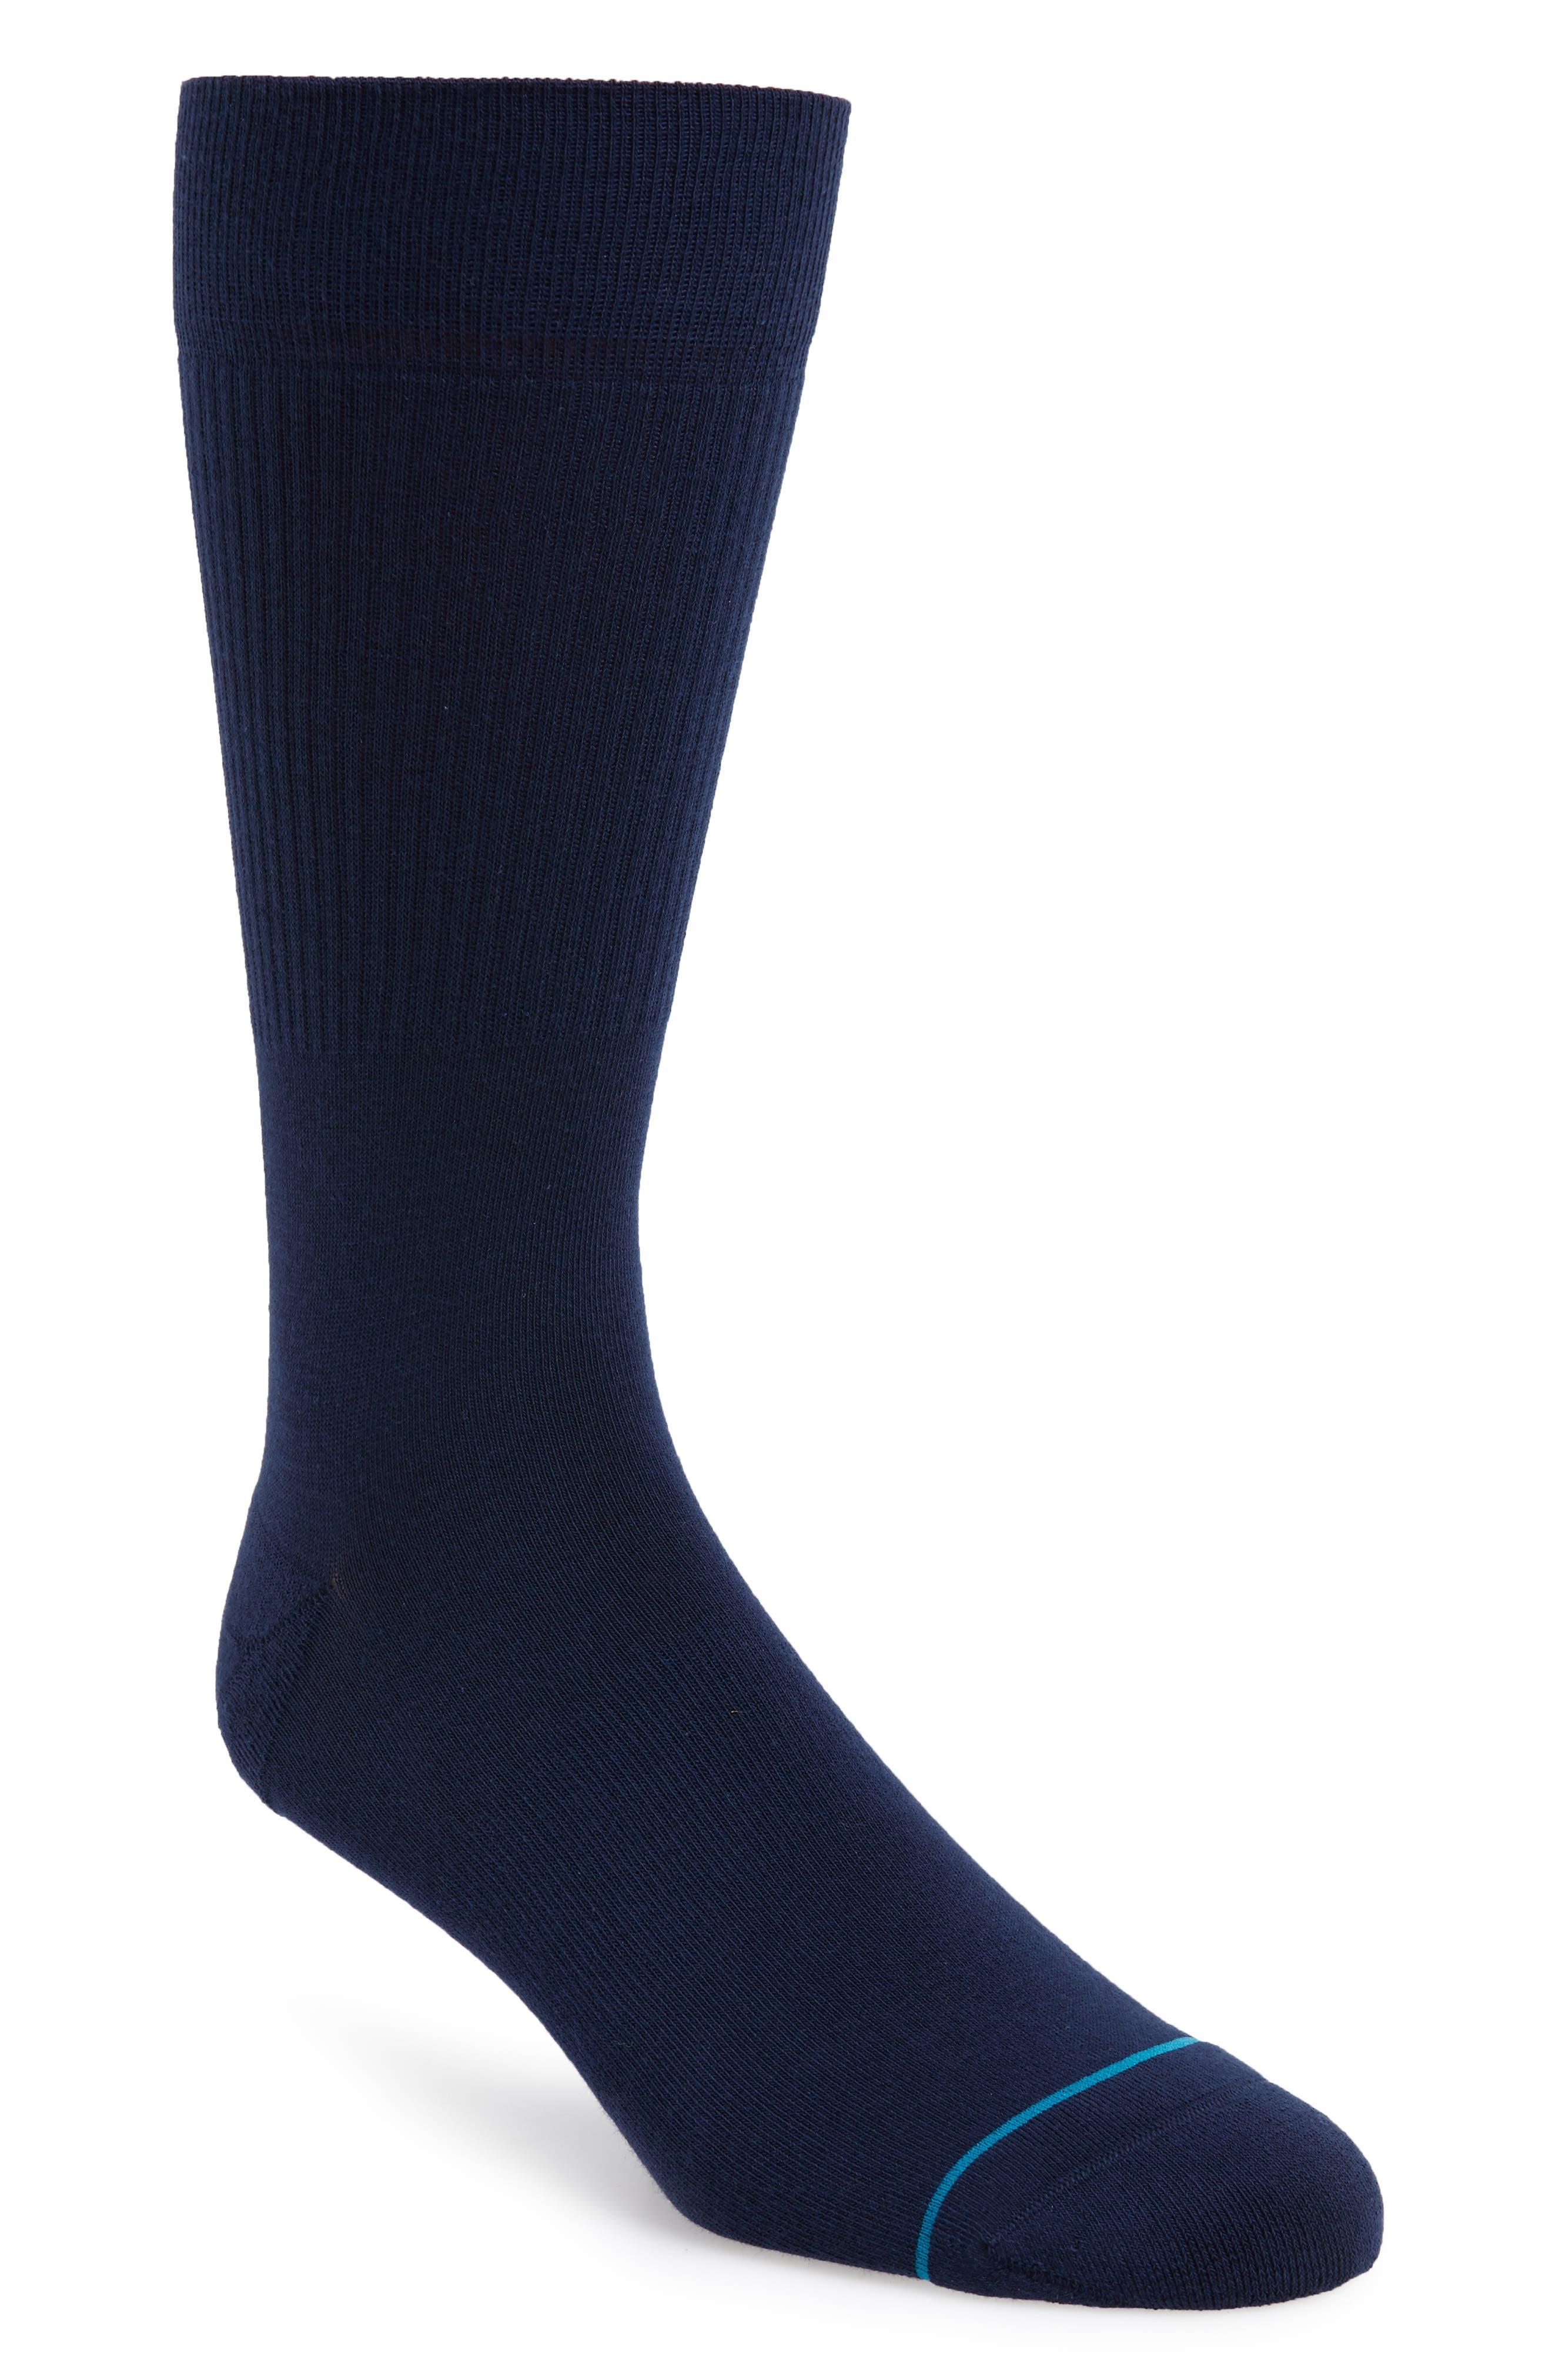 Fashion Icon Crew Socks,                             Main thumbnail 1, color,                             NAVY